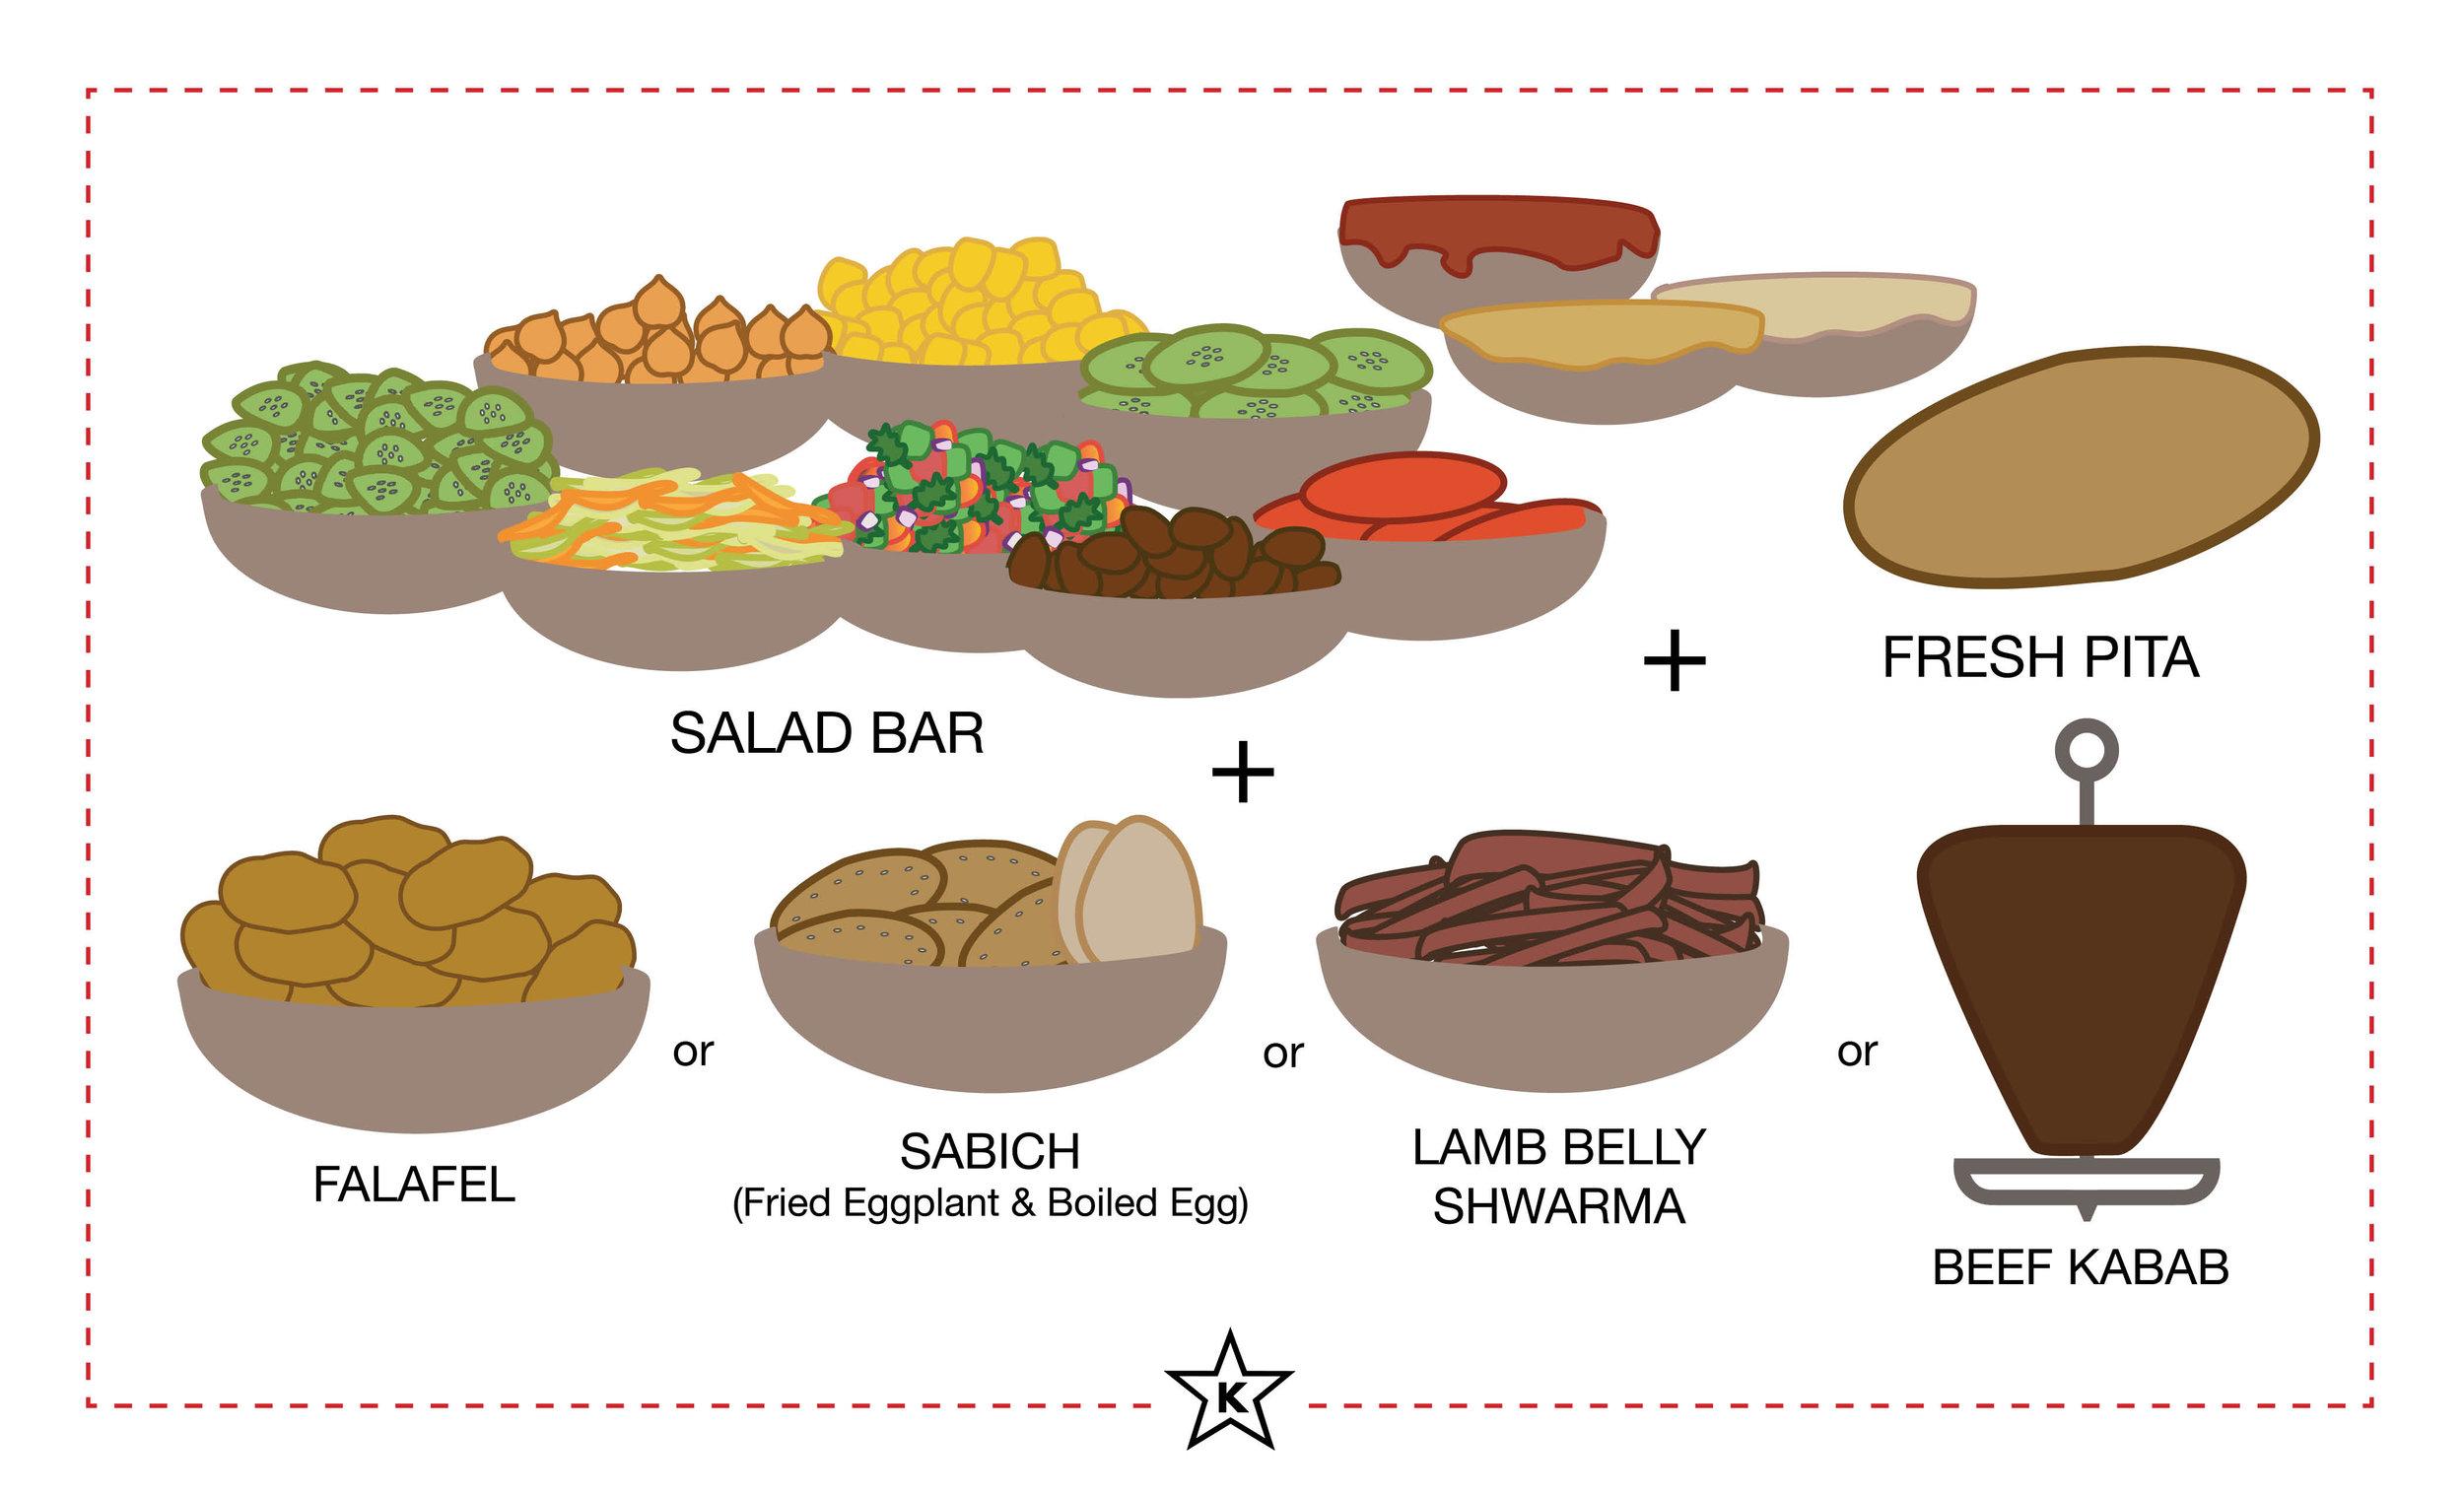 salad bar illustration w beef kebab.jpg